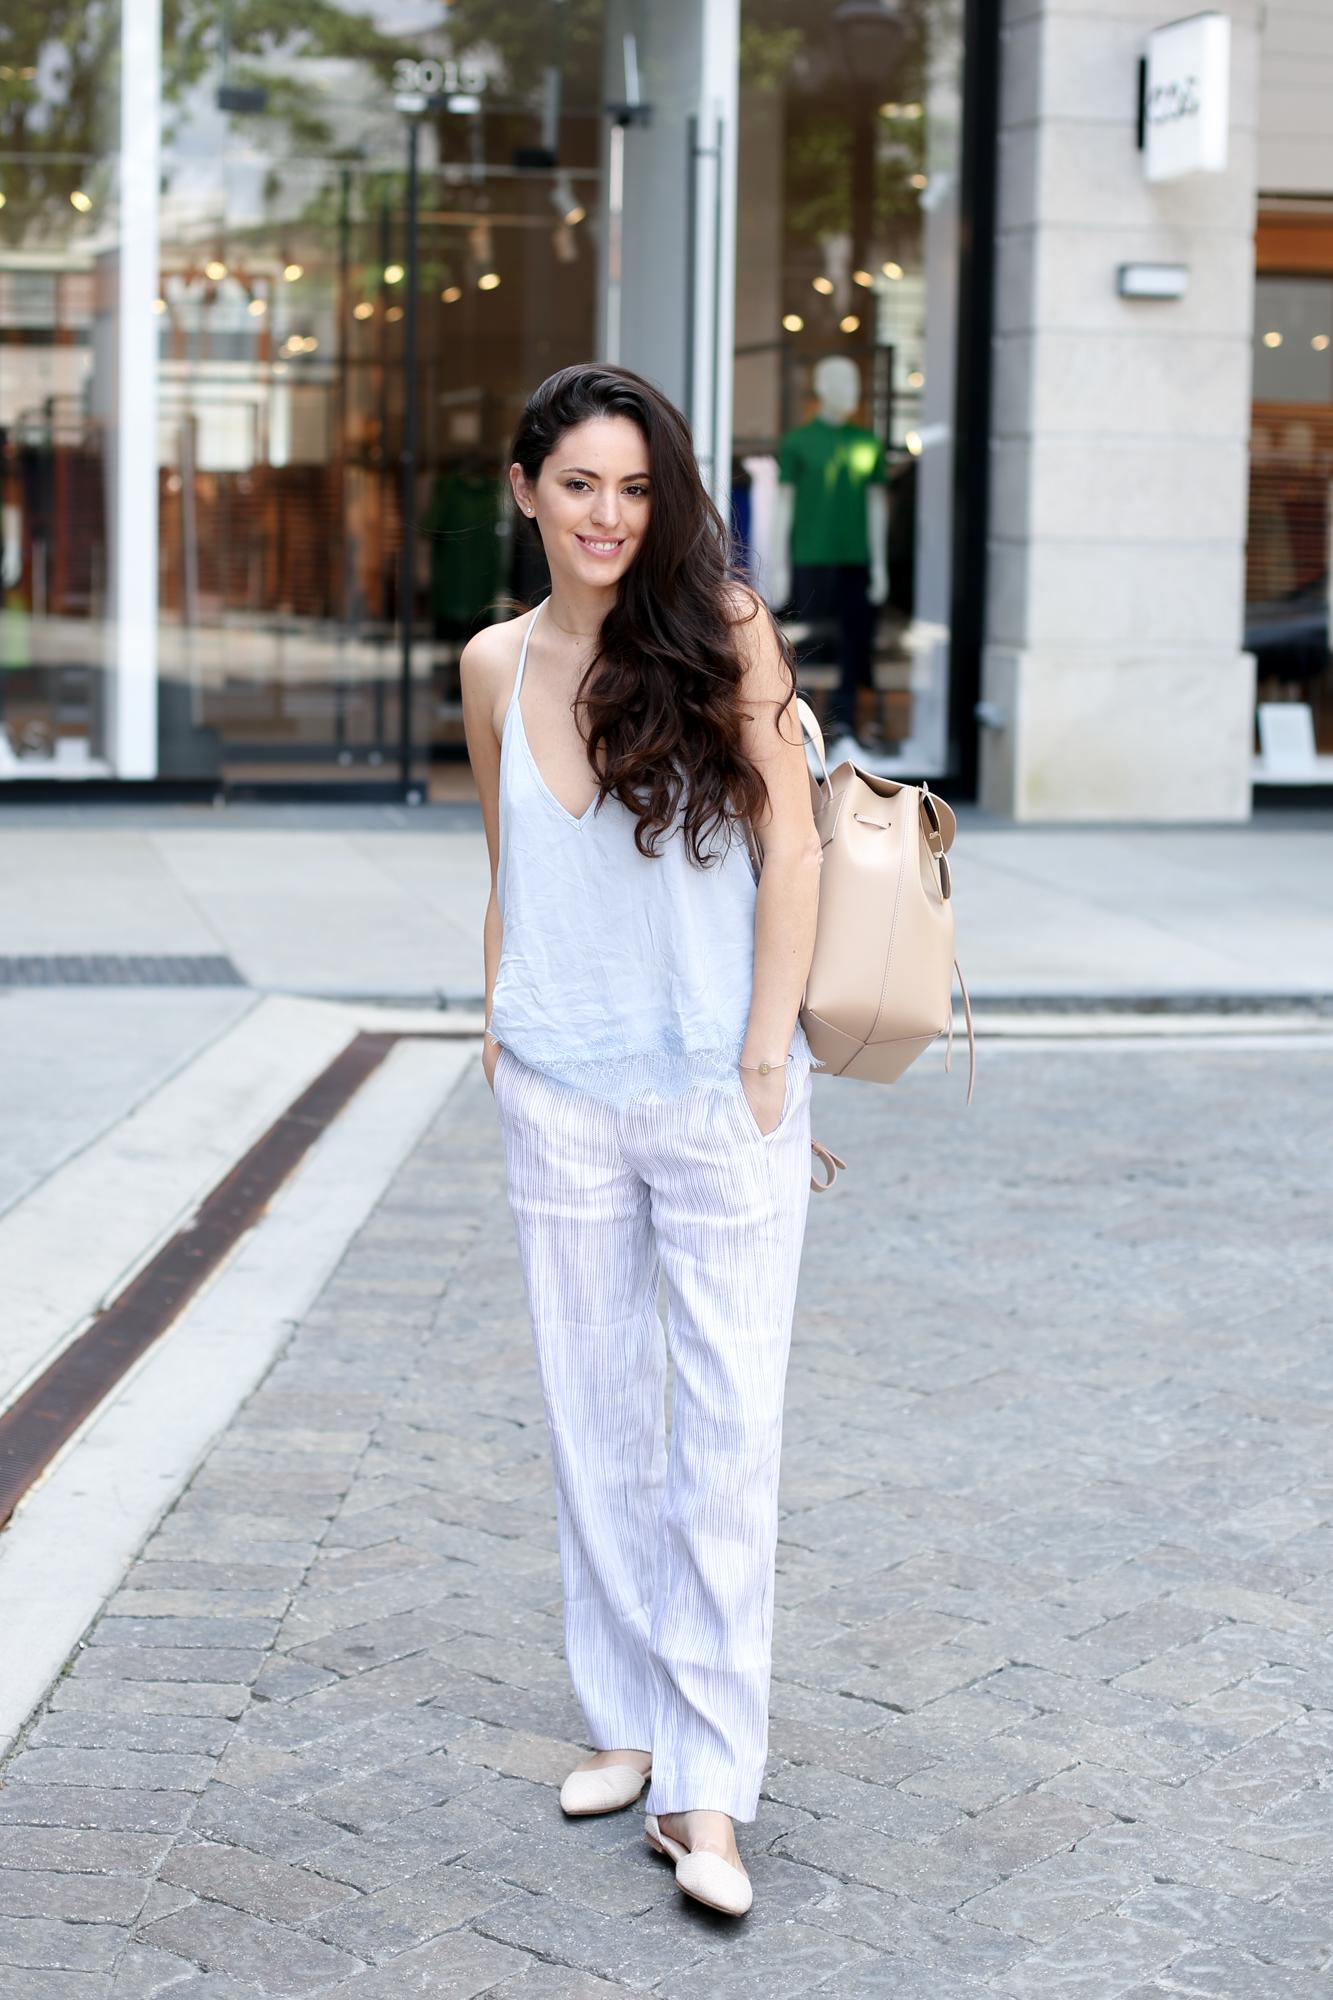 pajamas richard international disney thermal comfortable by comforter rvue leeds review